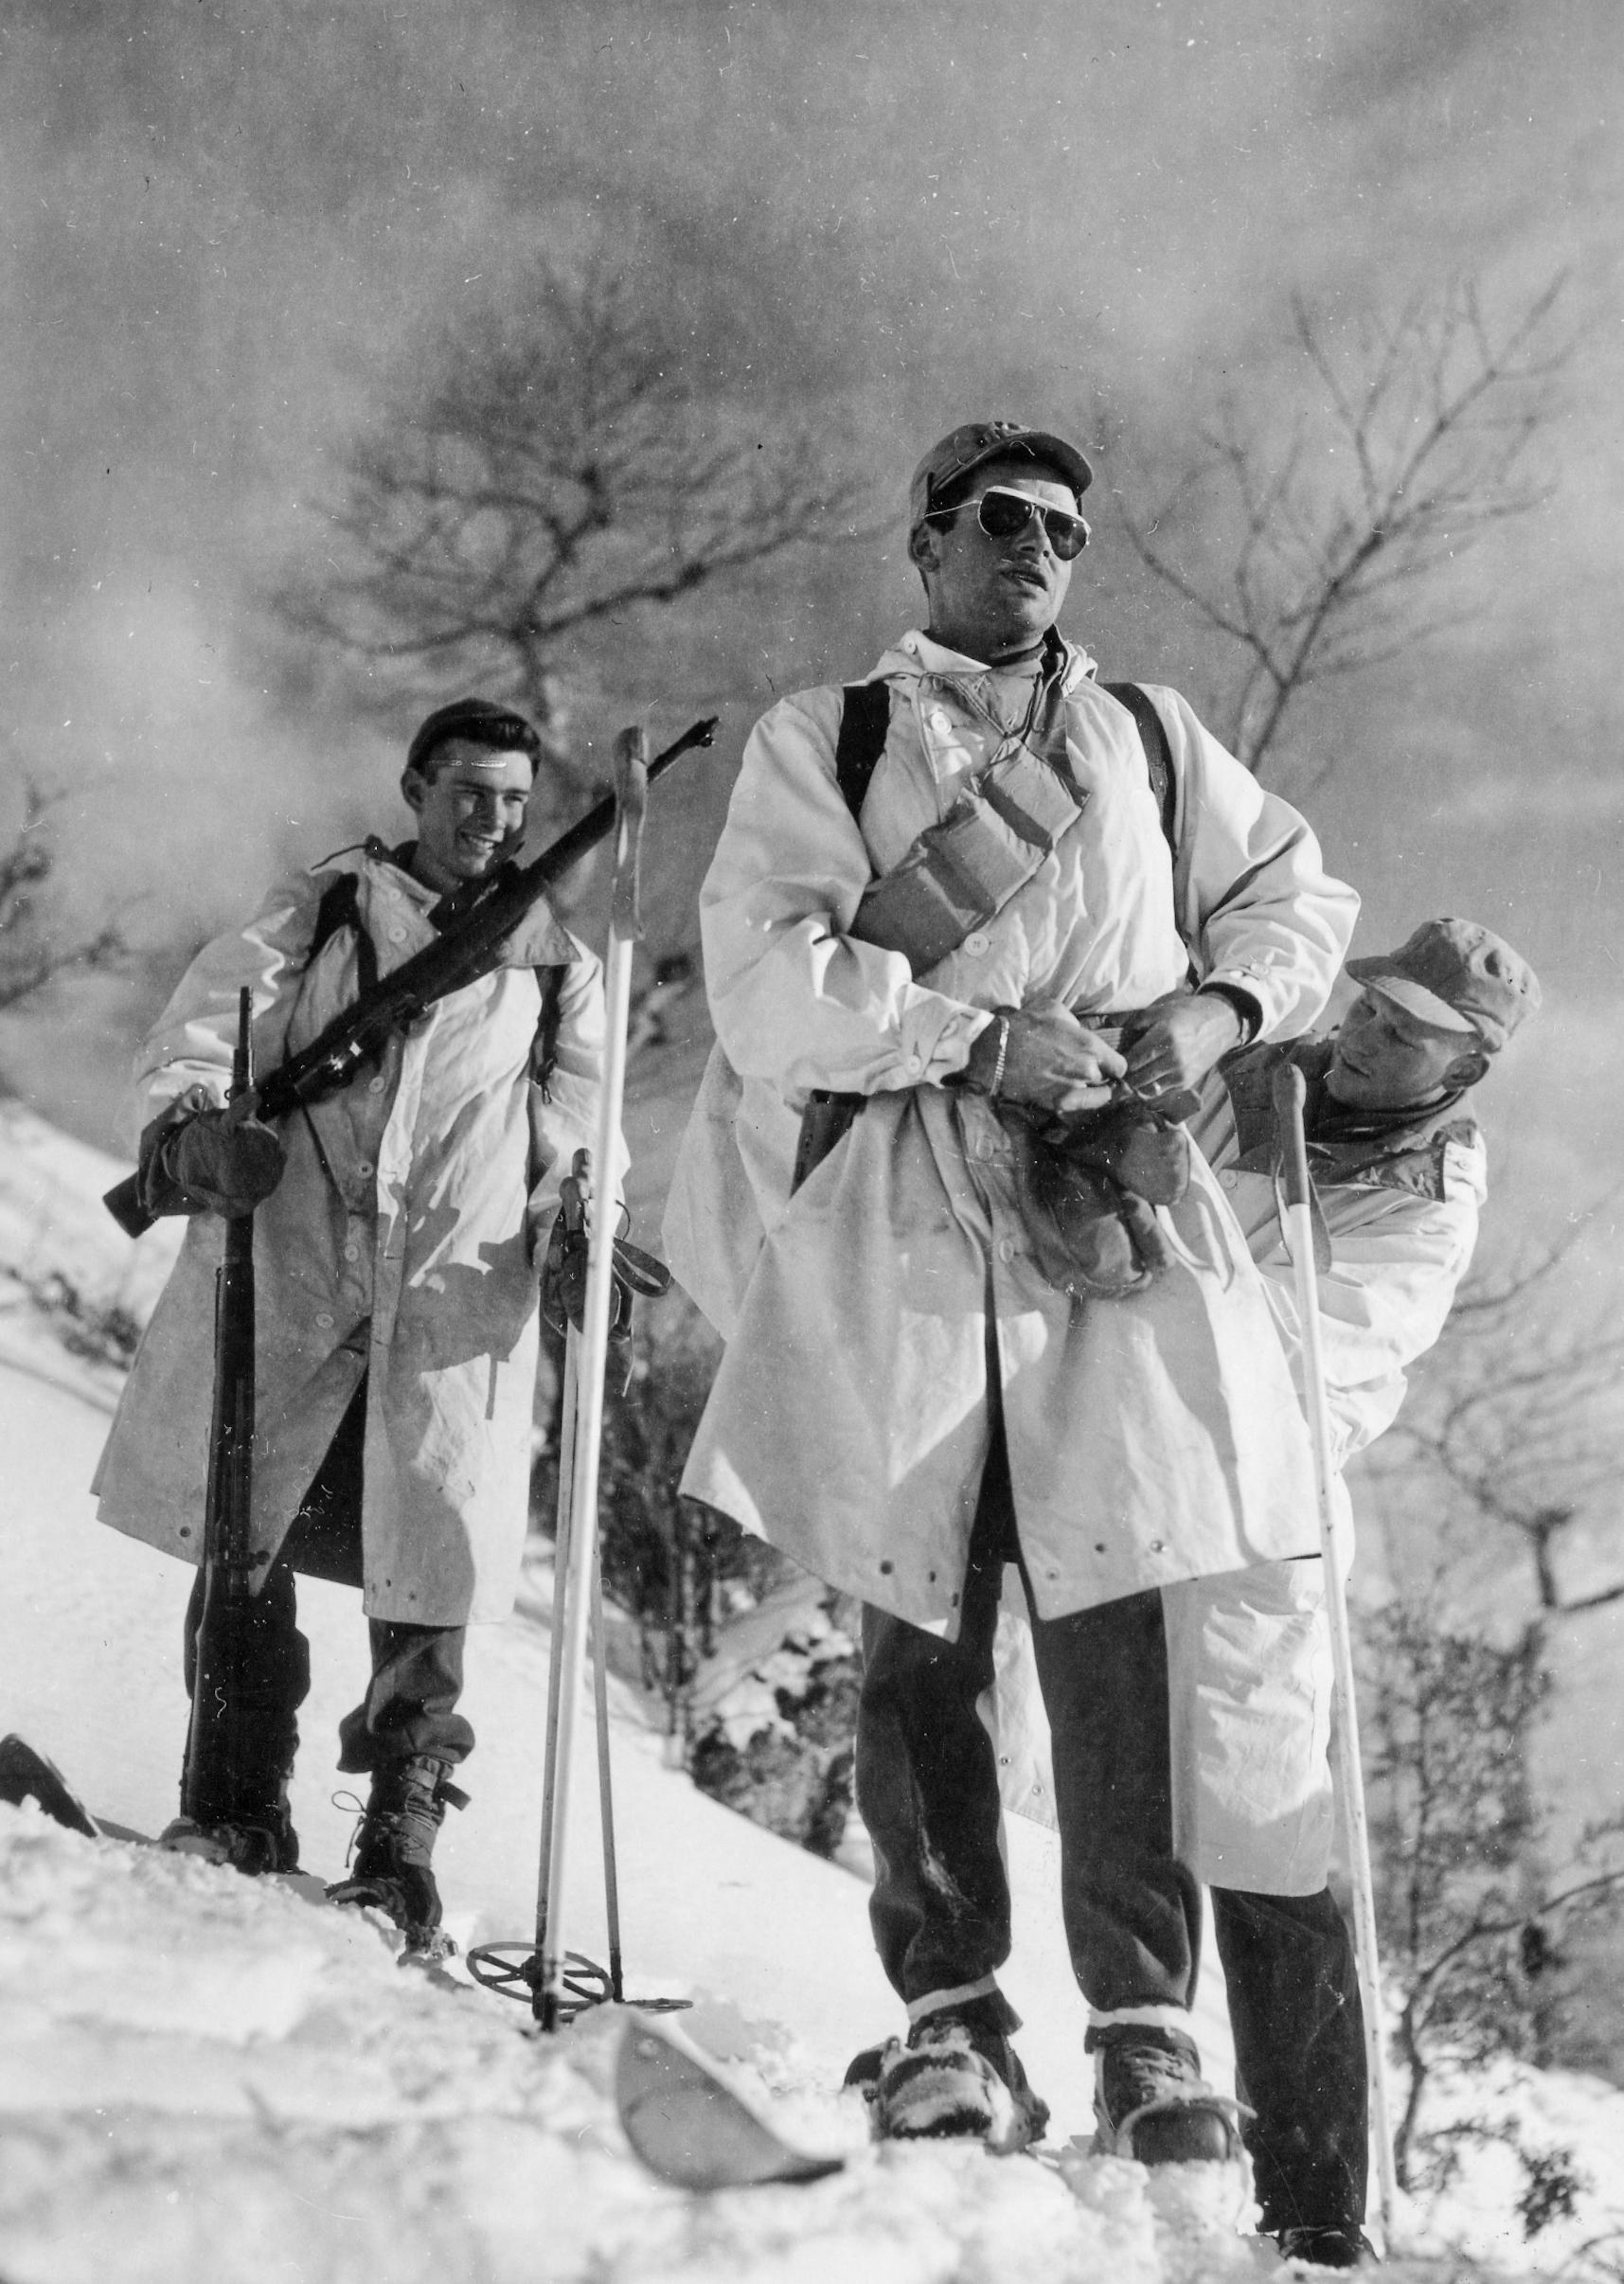 10th Mountain 86th Mount Inf Reg I&R Plt Ski Troops Spigvana Italy 012145 (1 of 1)